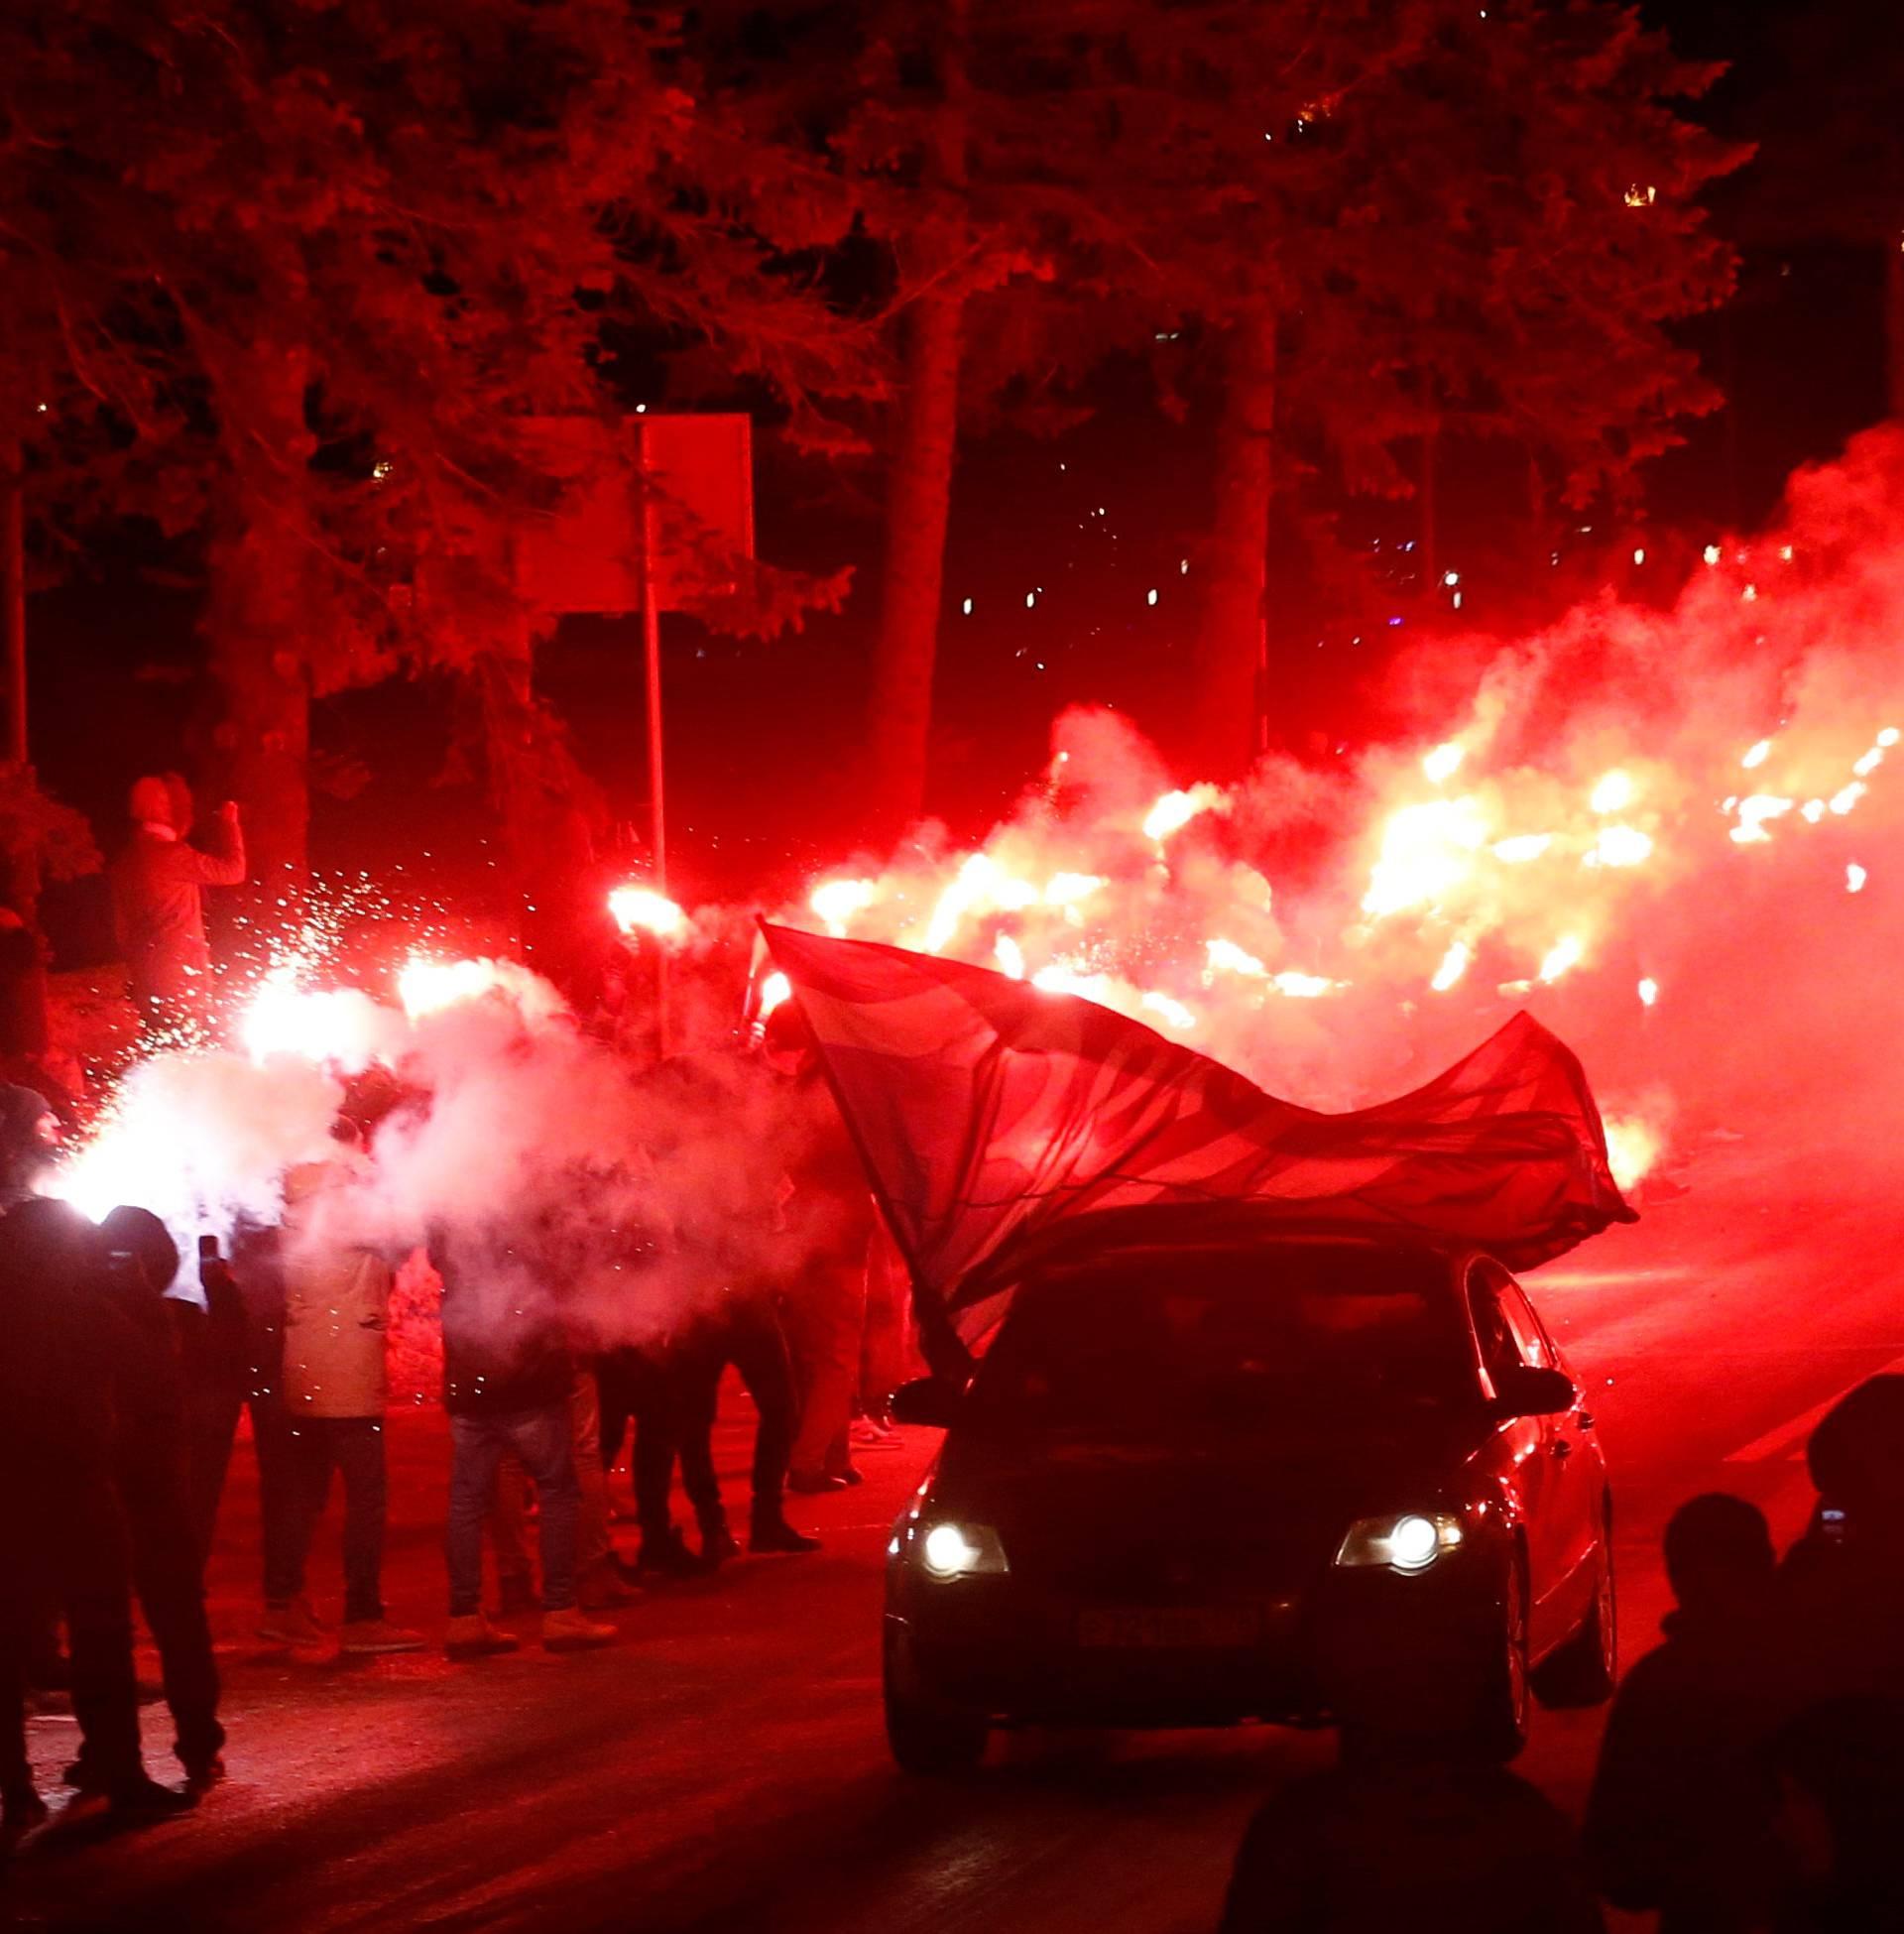 Europa League - Round of 32 Second Leg - Zenit Saint Petersburg v Fenerbahce